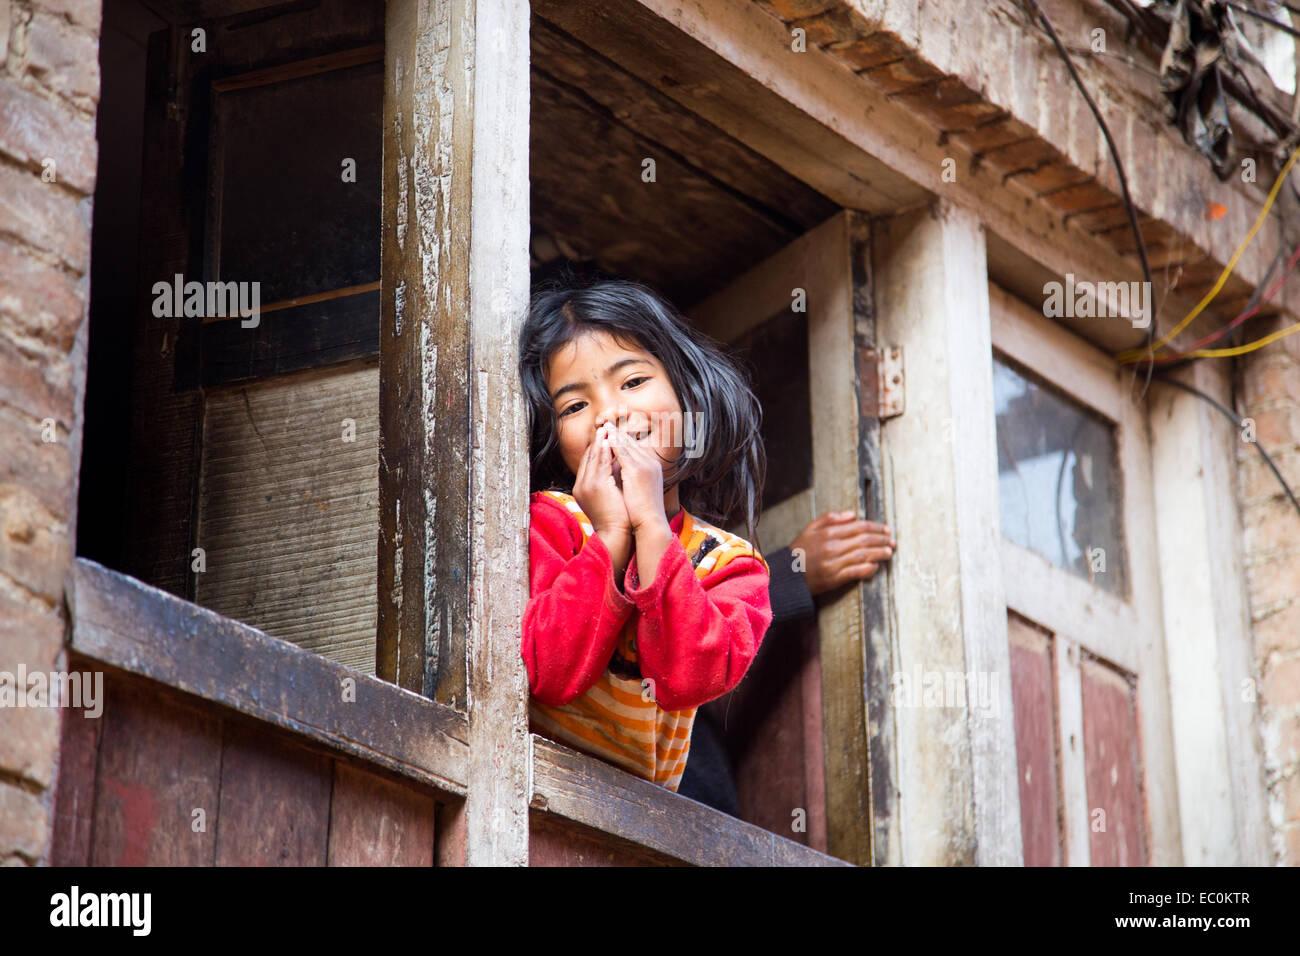 Namaste, young Napali girl in a window in Bhaktapur, Nepal Stock Photo